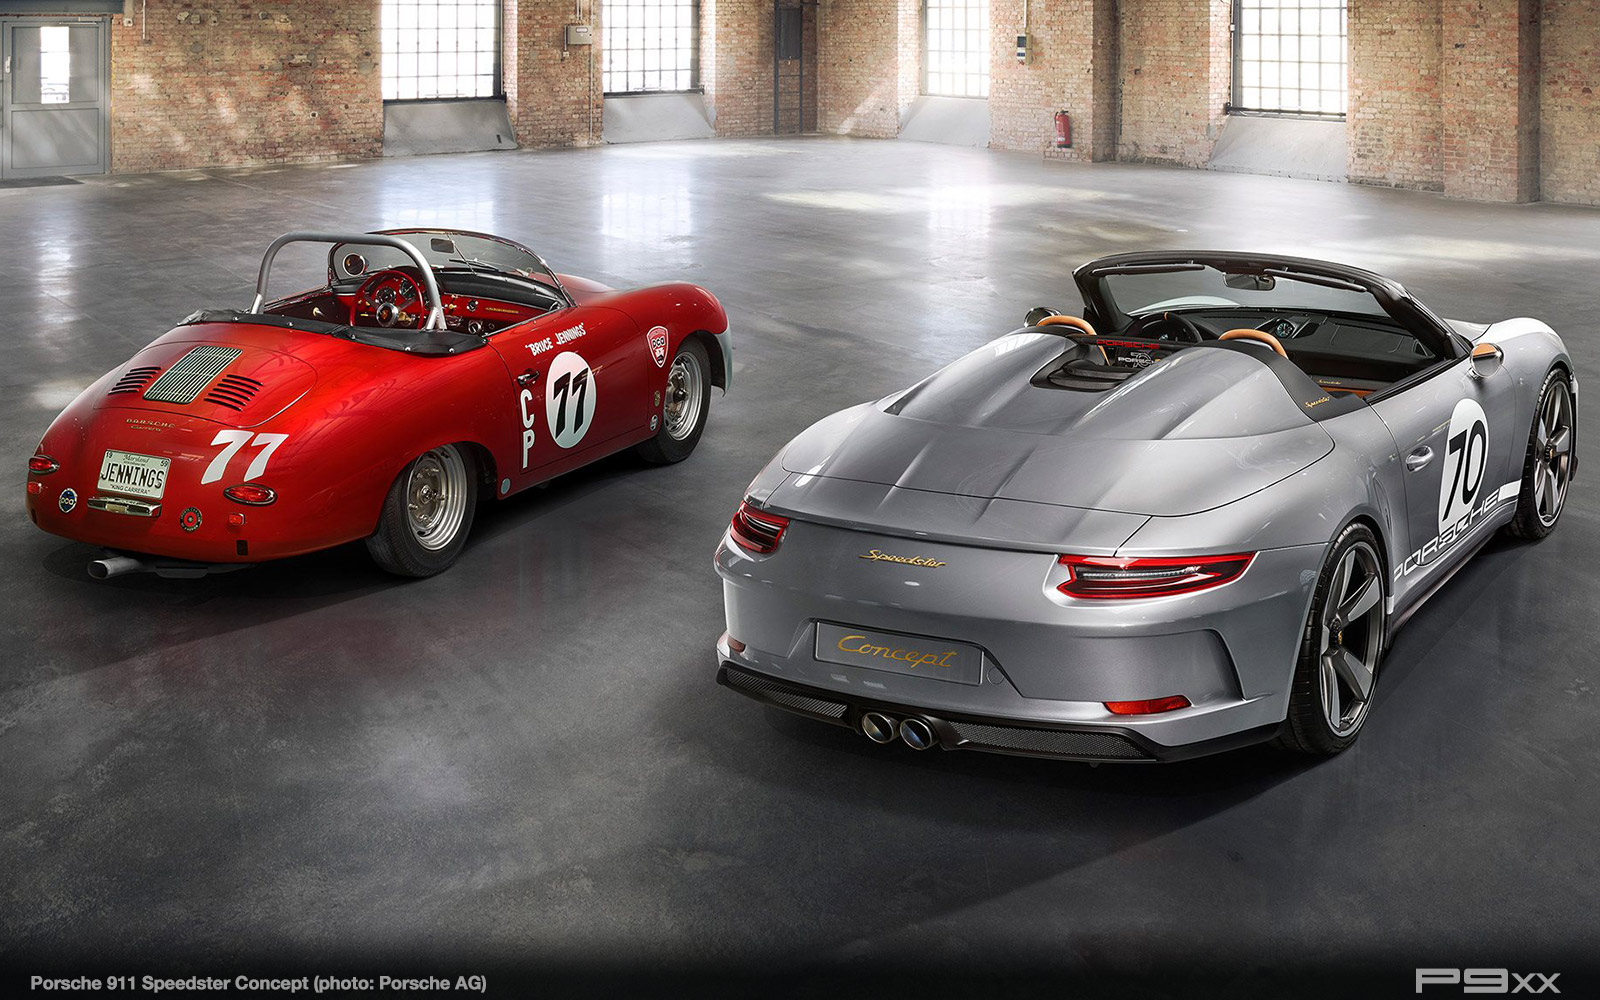 Porsche-911-Speedster-Concept-2018-293